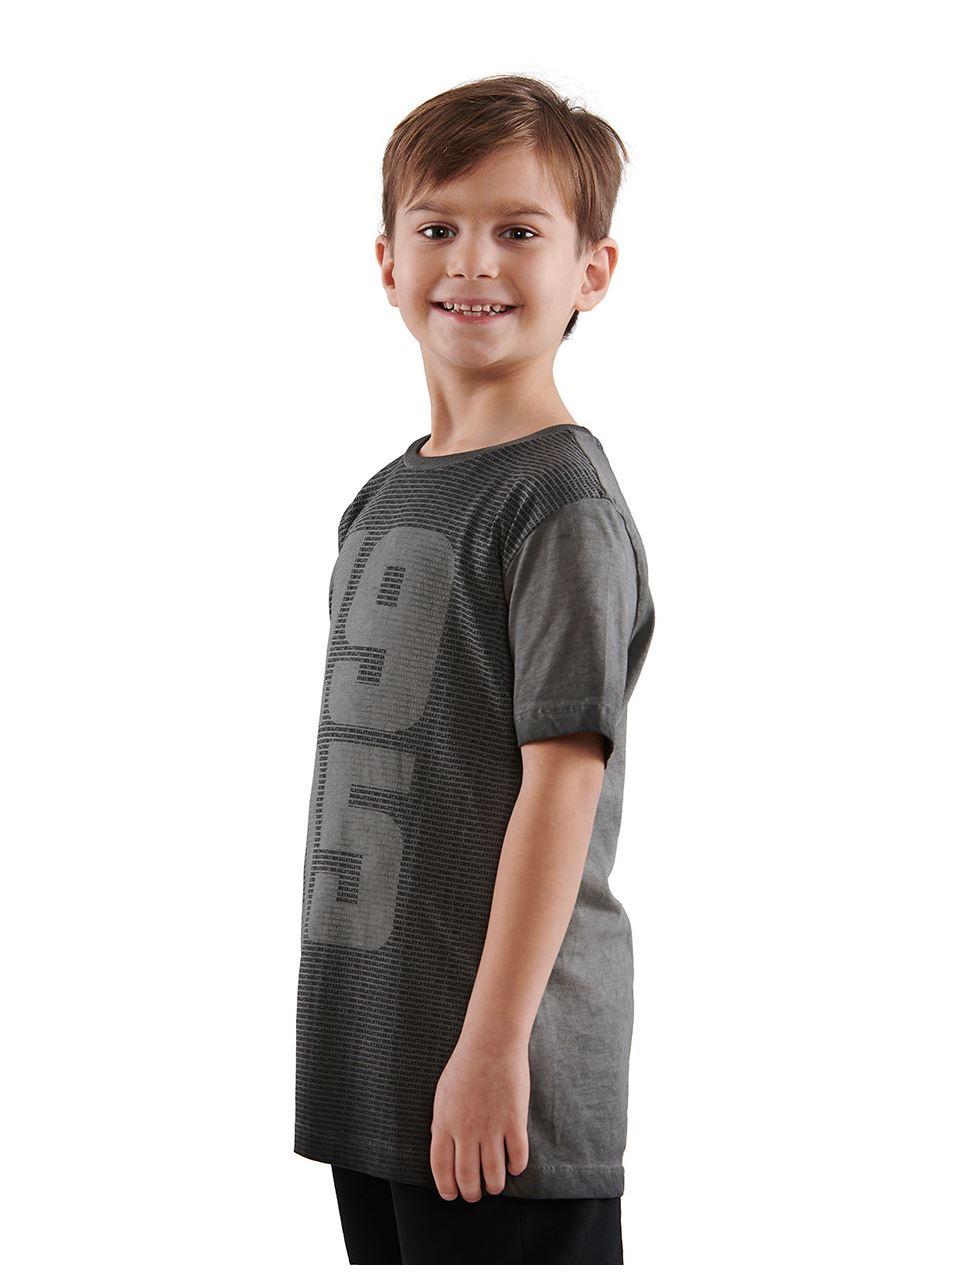 C95172 T-shirt